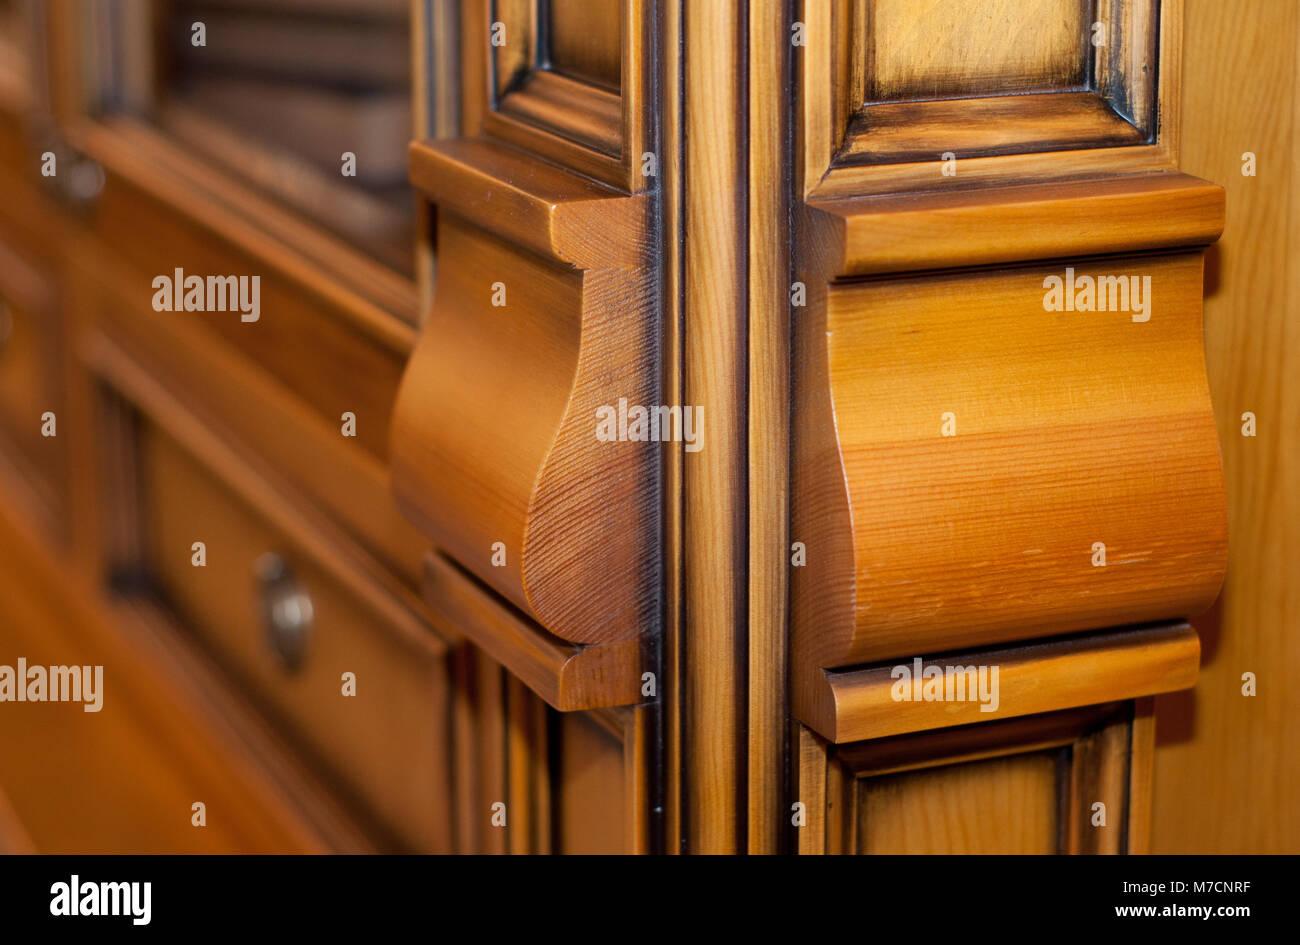 detail of a beautiful wooden closet close-up - Stock Image